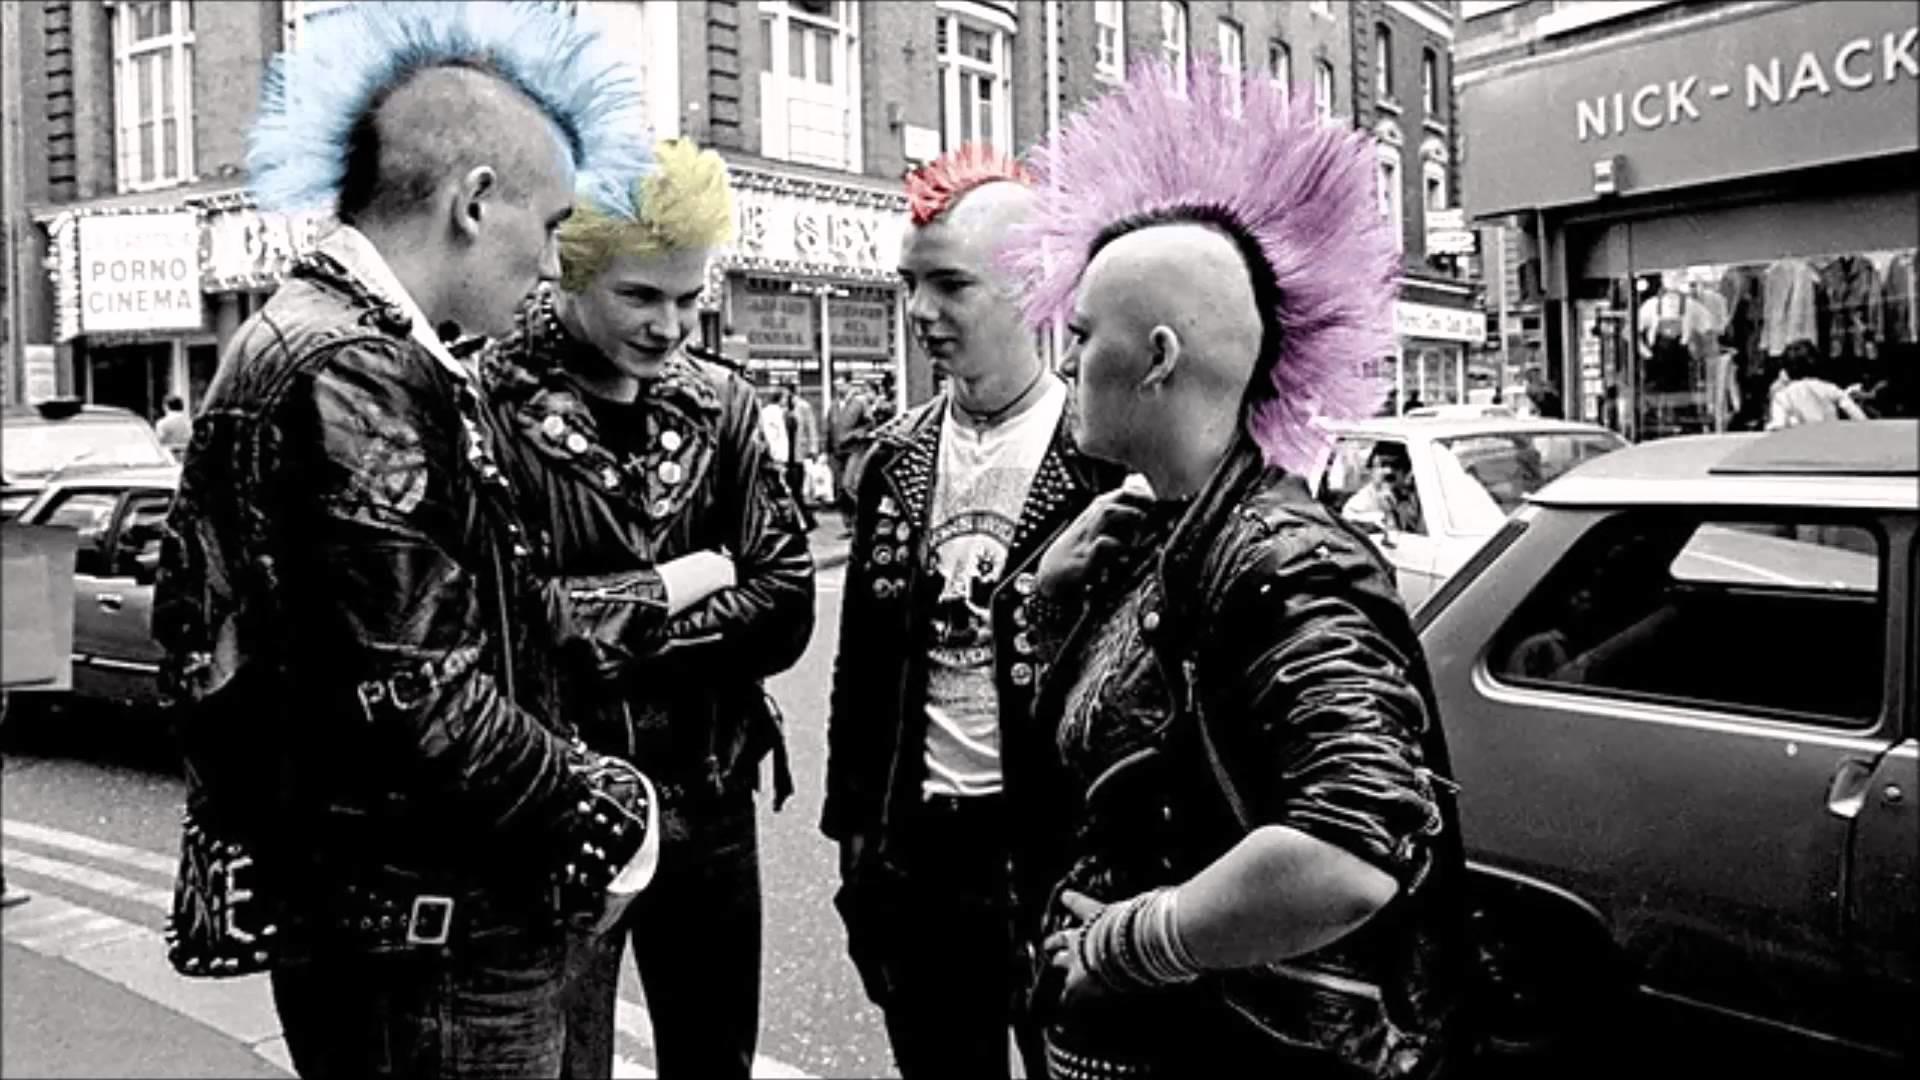 Anarchy Punk Wallpaper ·①